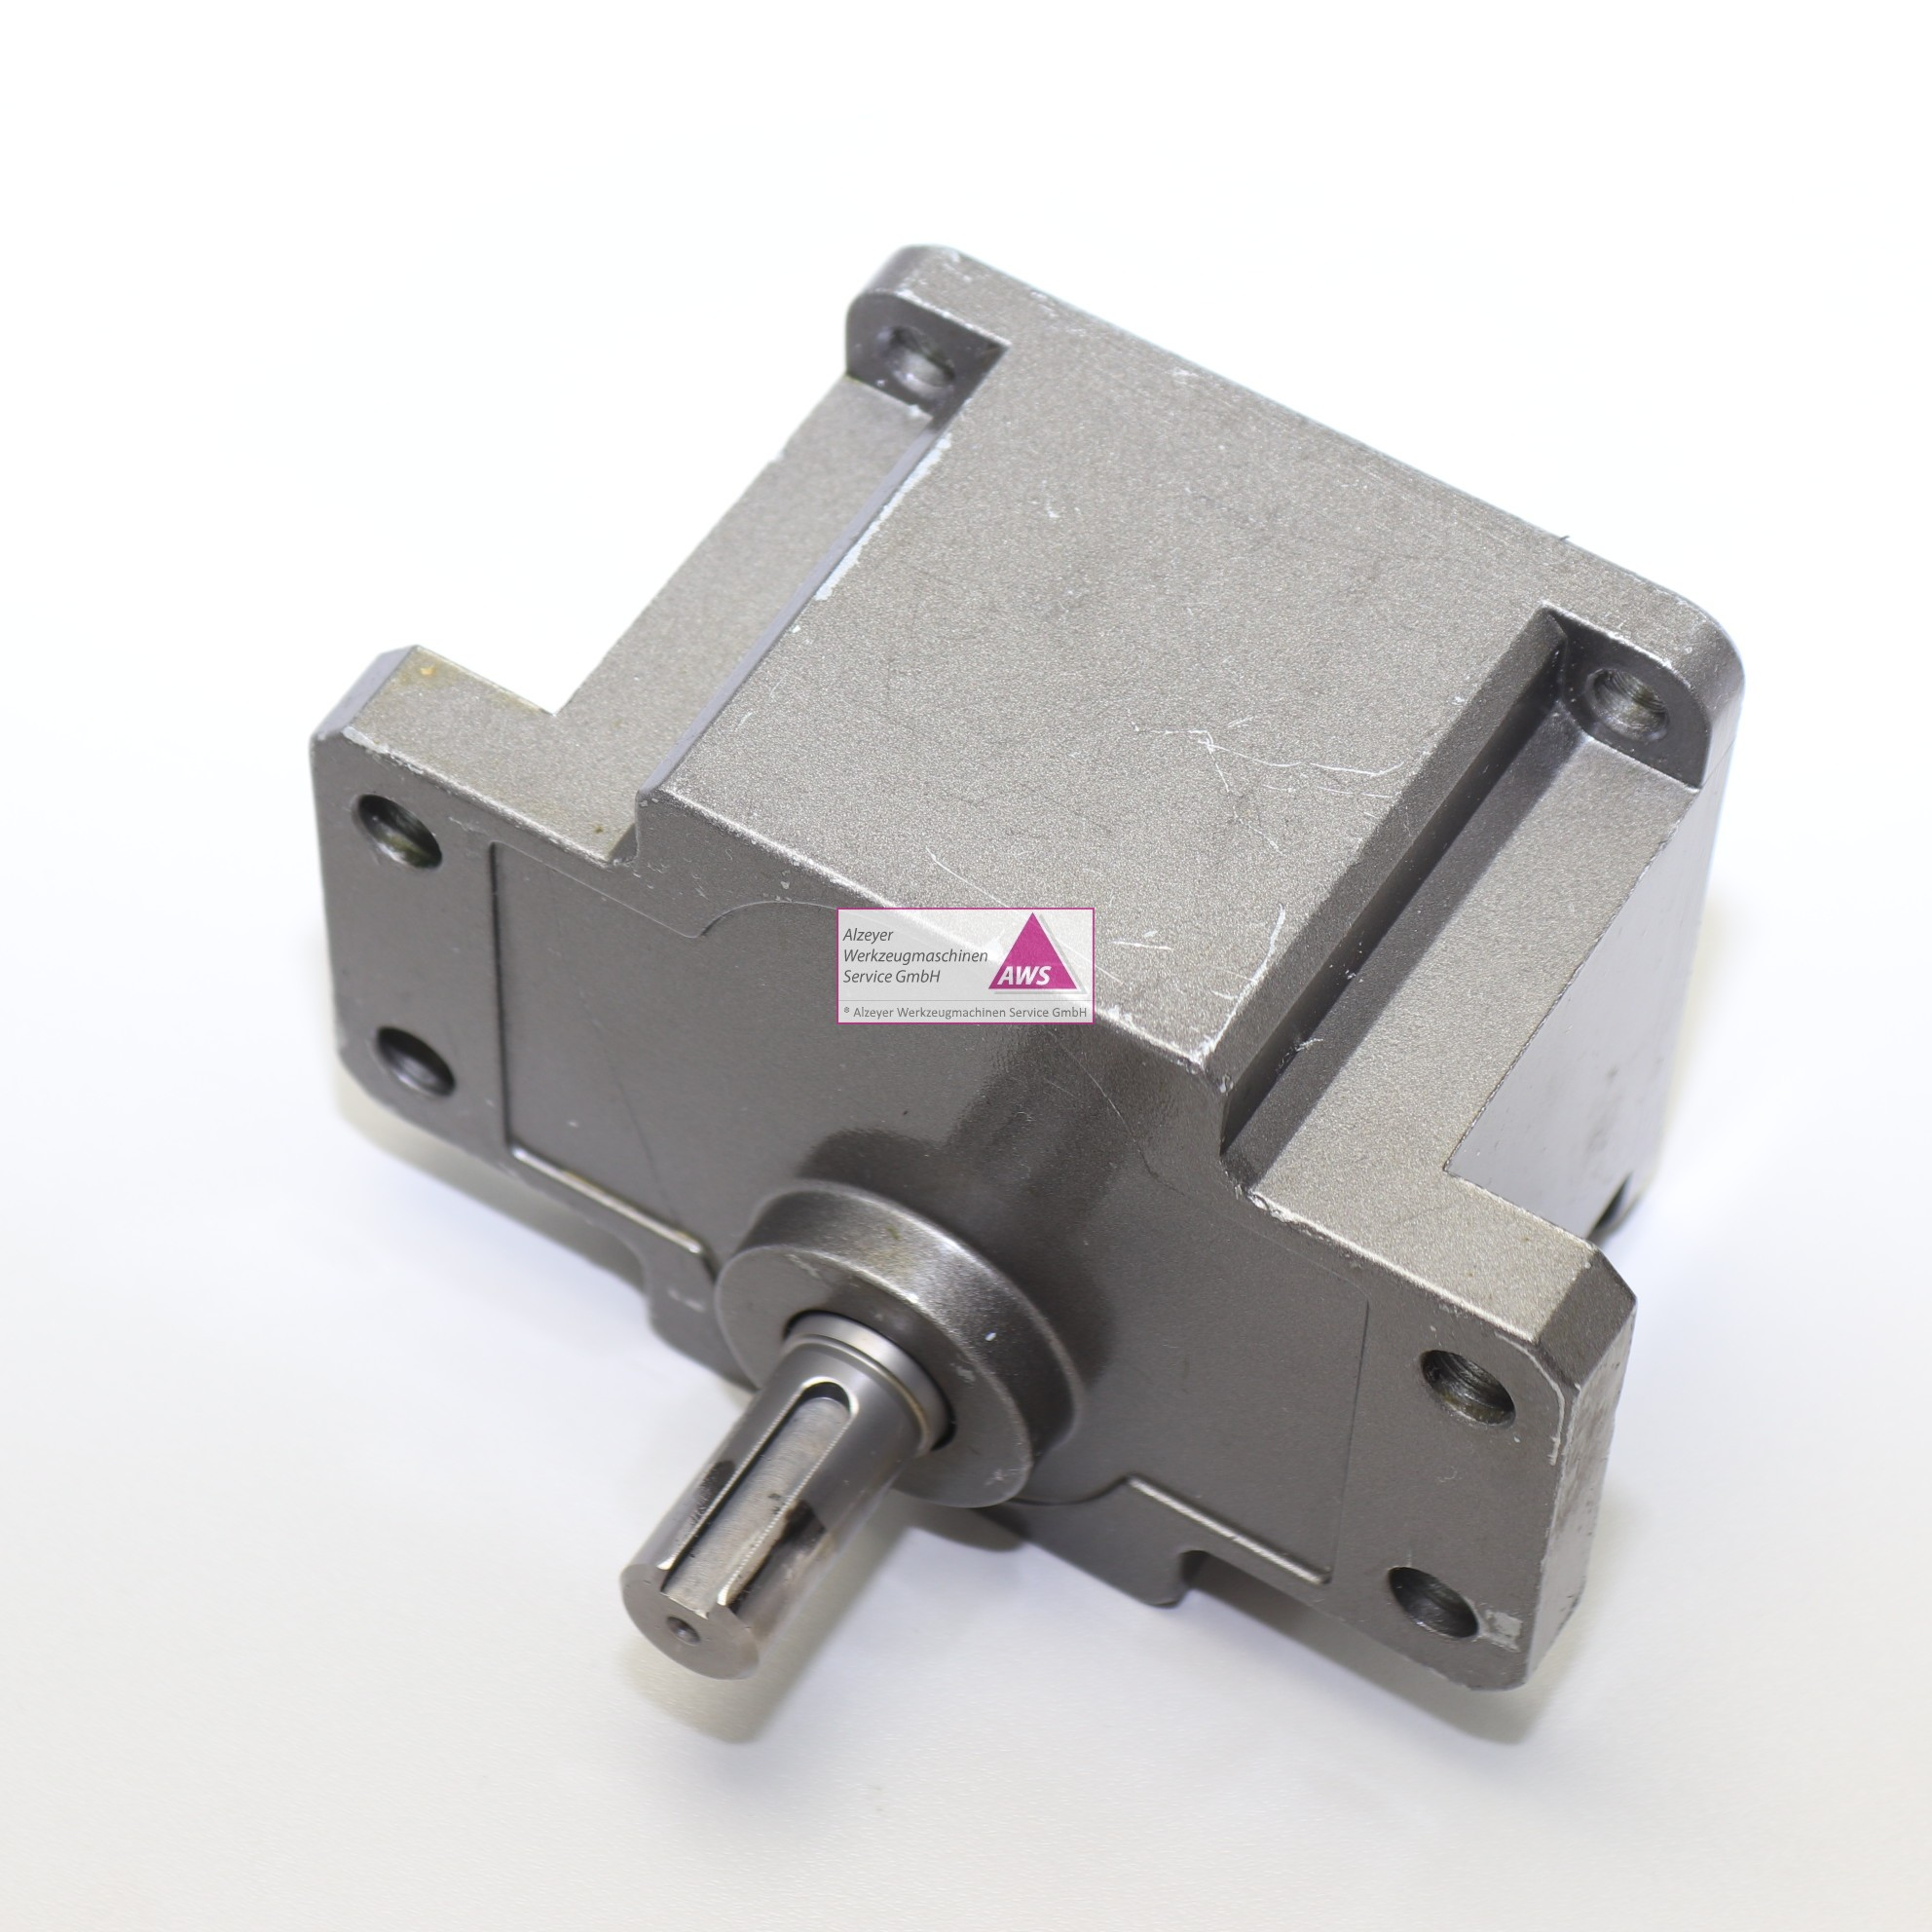 Revolvergetriebe  M9GC20B